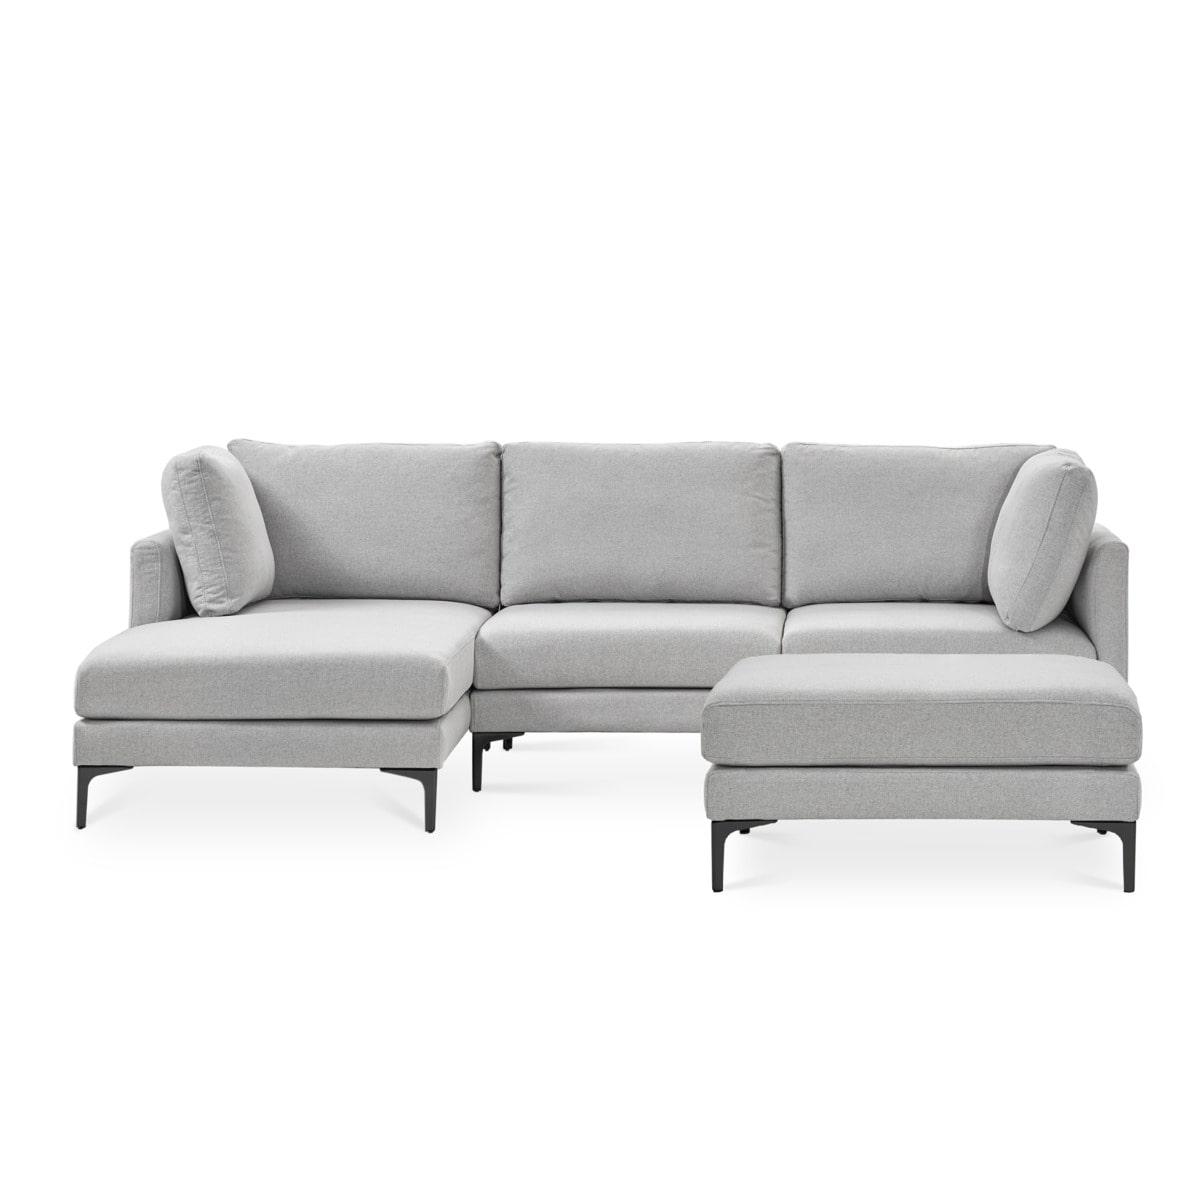 Adams Chaise Sectional Sofa Left Facing with Ottoman Dove Grey, Black Leg